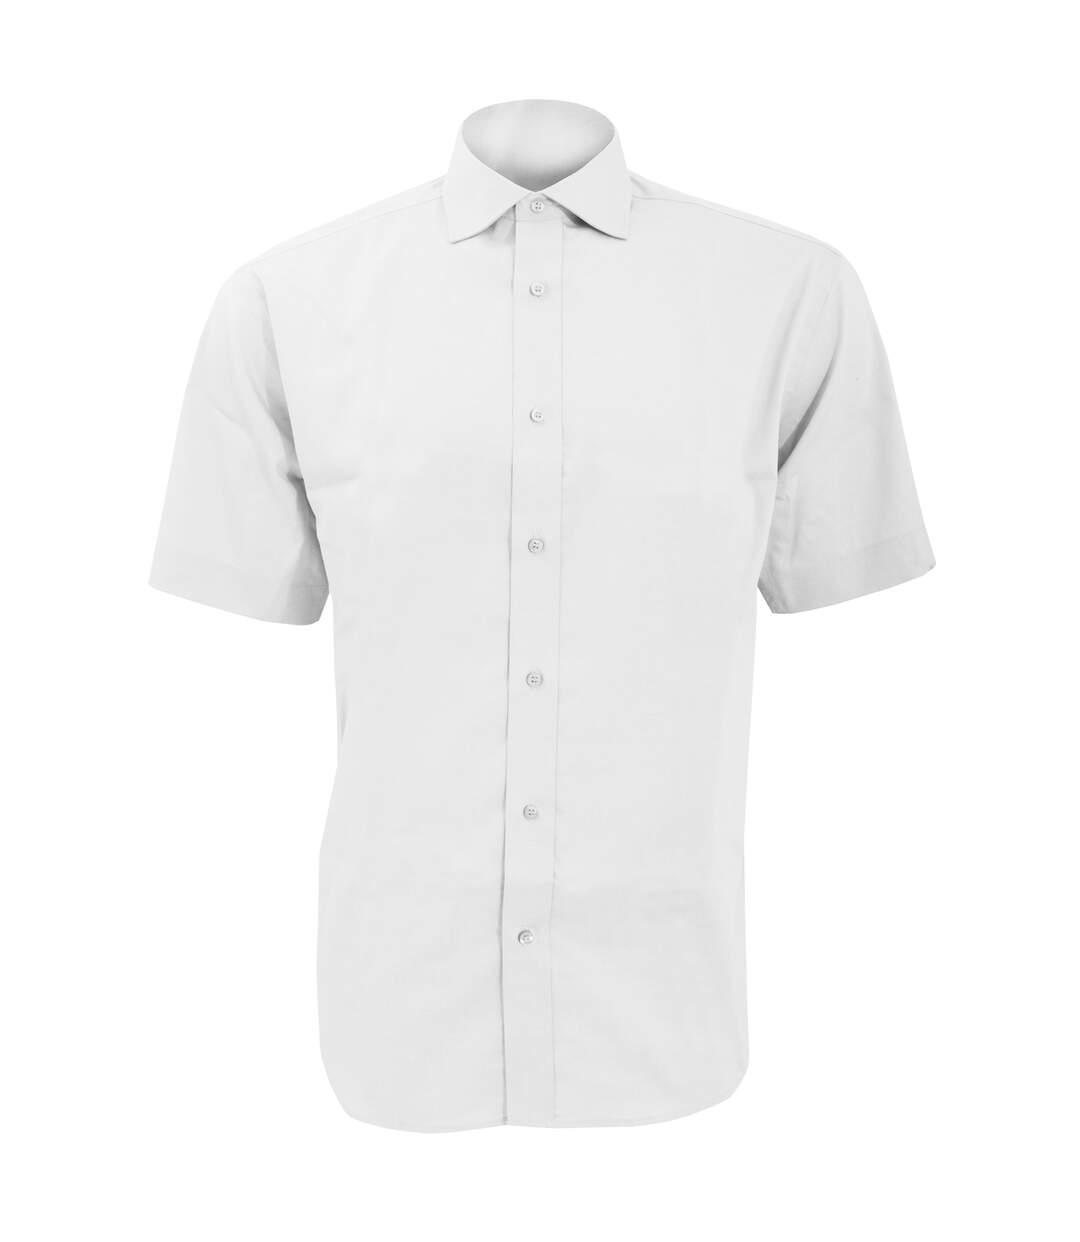 Kustom Kit - Chemise à manches courtes - Homme (Blanc) - UTBC598